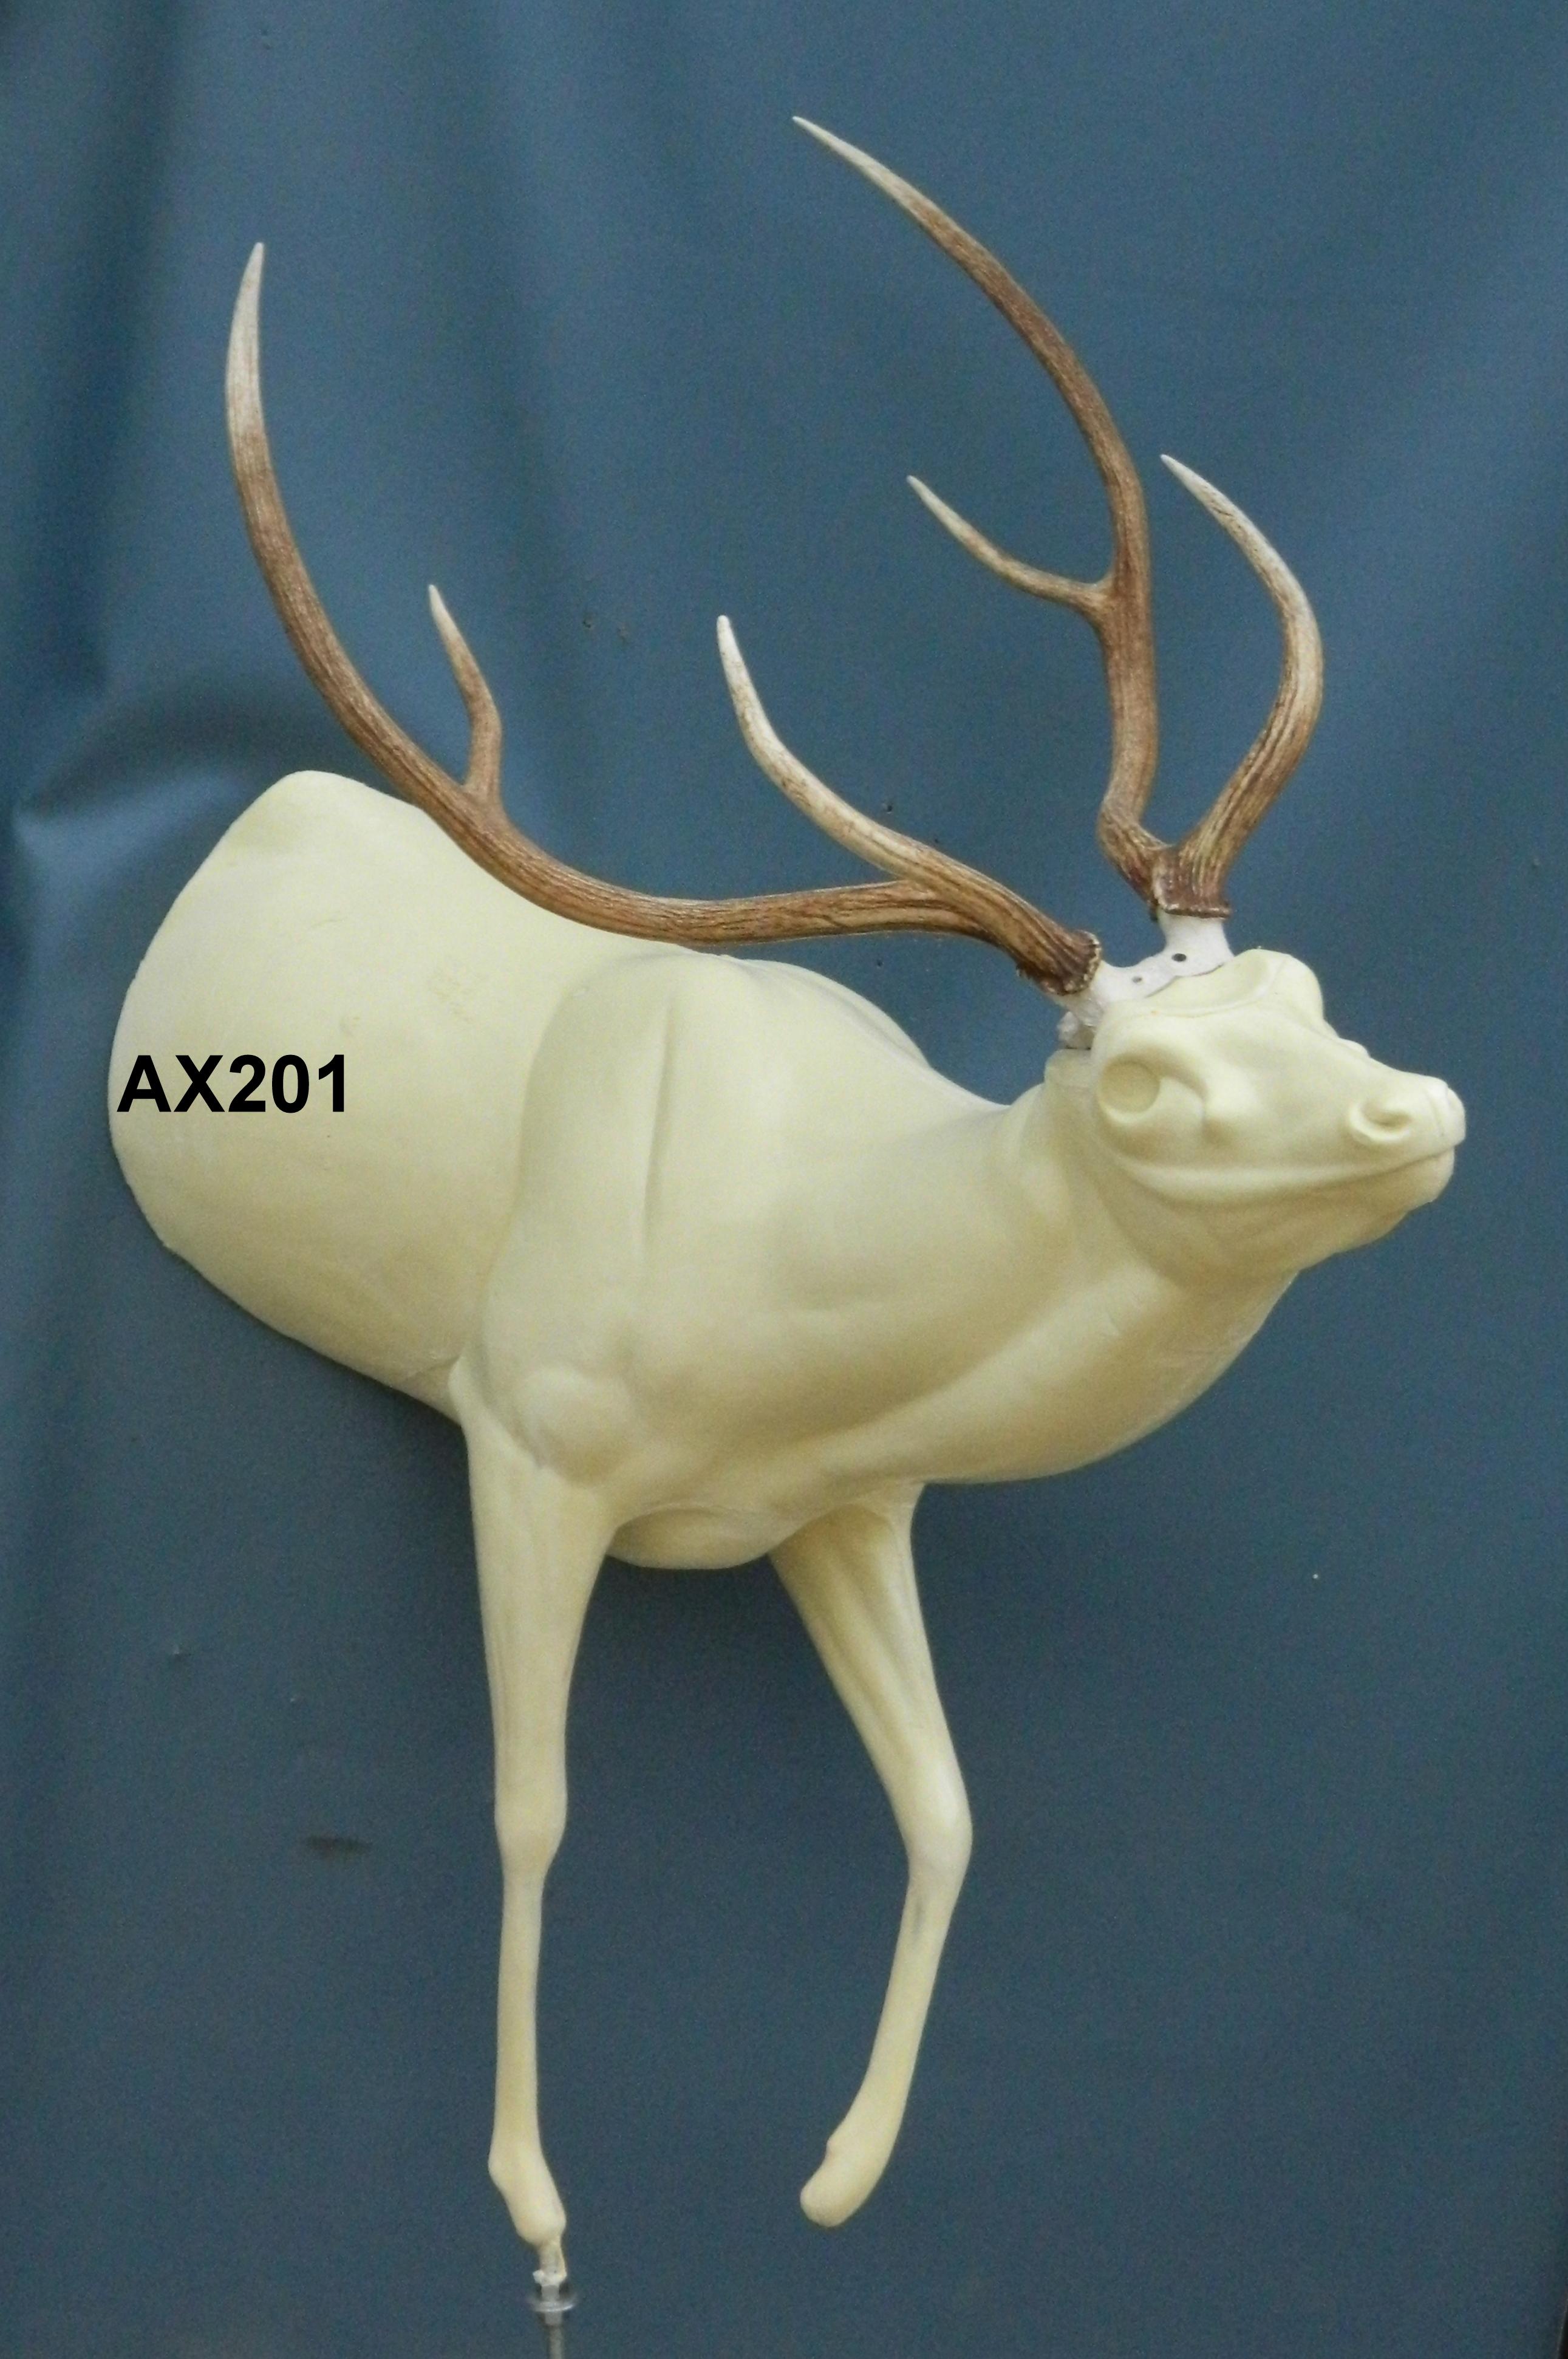 AX201